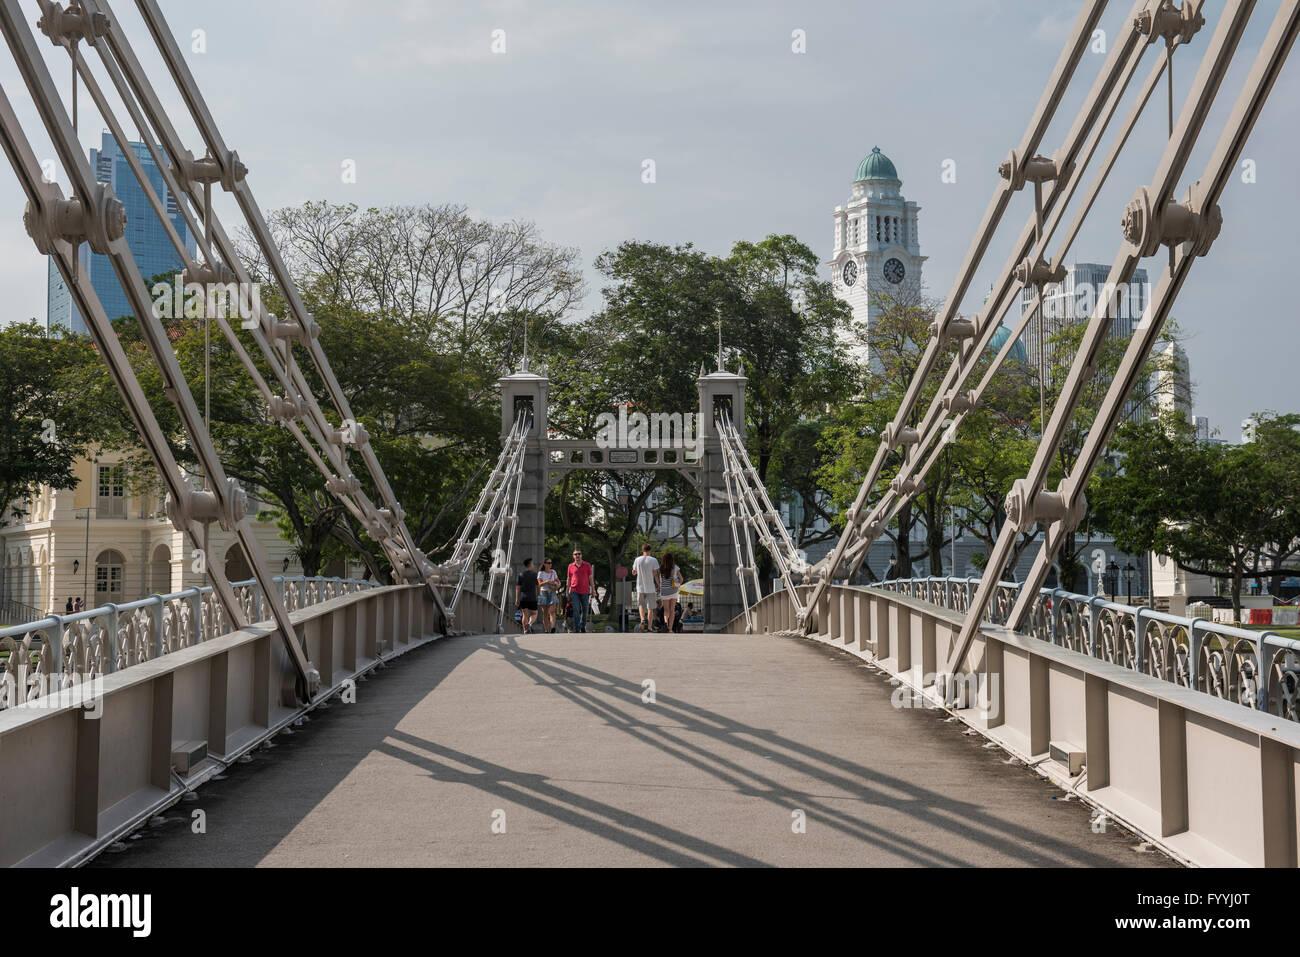 Cavenagh Bridge Spanning the Singapore River near the Fullerton Hotel, Singapore - Stock Image